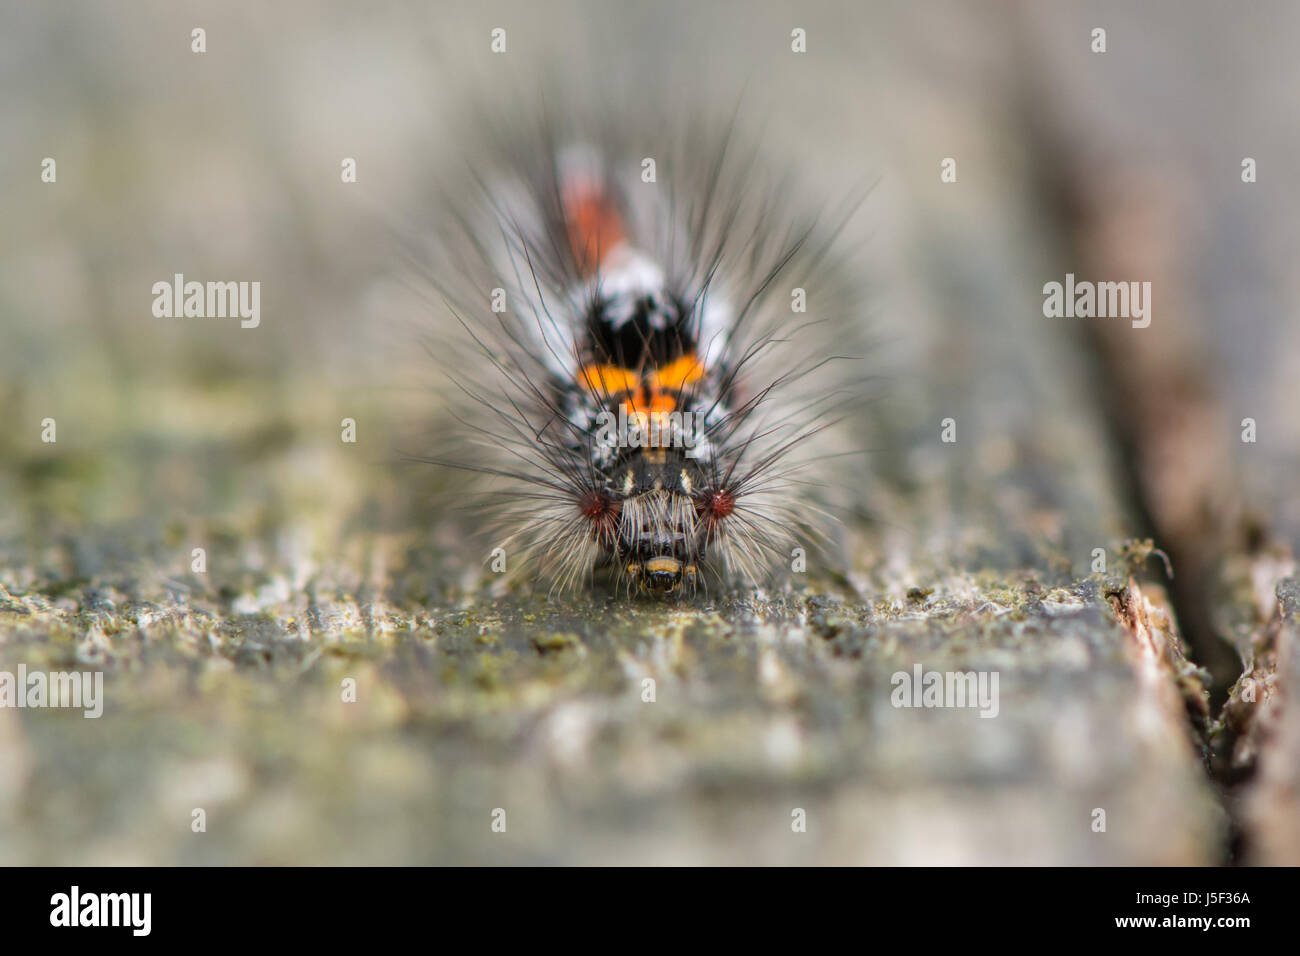 Gelb-Tail Motte (Euproctis Similis) Raupe. Larve in Familie Erebidae, Unterfamilie Lymantriinae bedeckt mit Haaren Stockbild